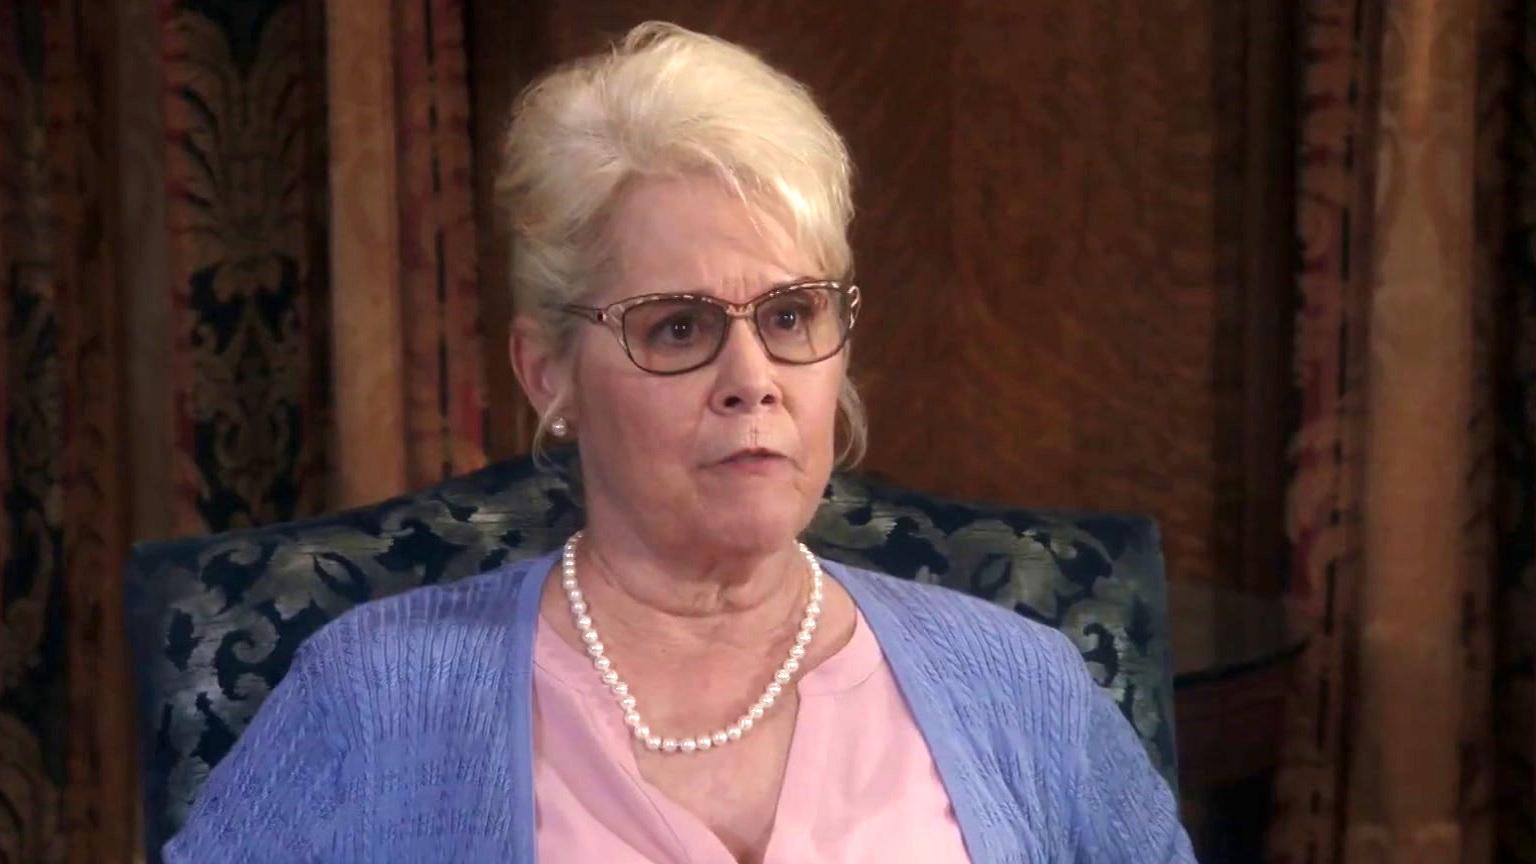 Brooklyn Nine-Nine: Rosa Opens Up